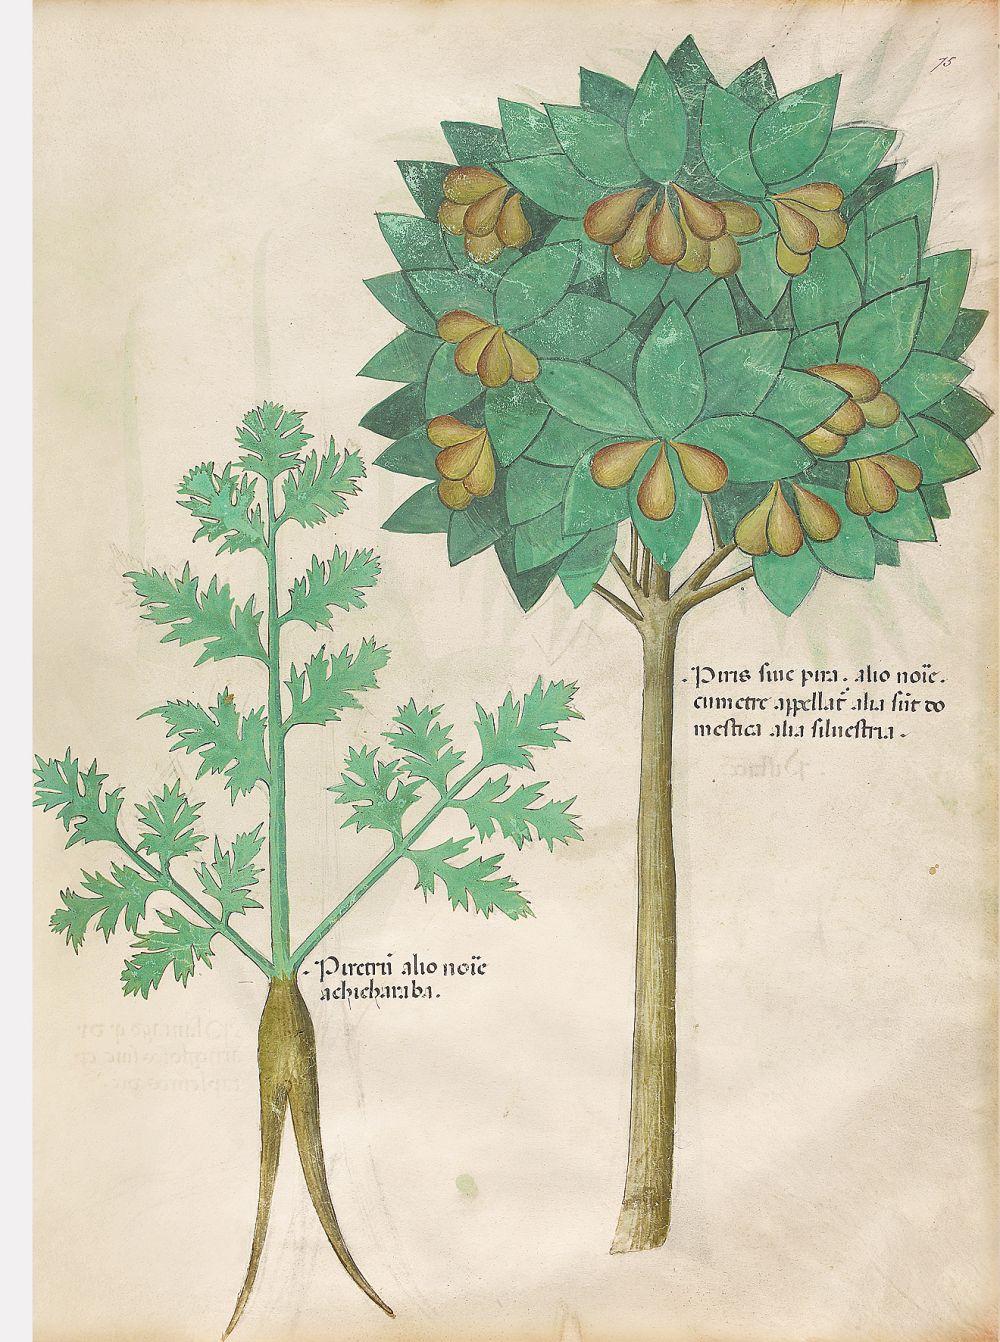 Tractatus de Herbis - Sloane 4016 f. 75r